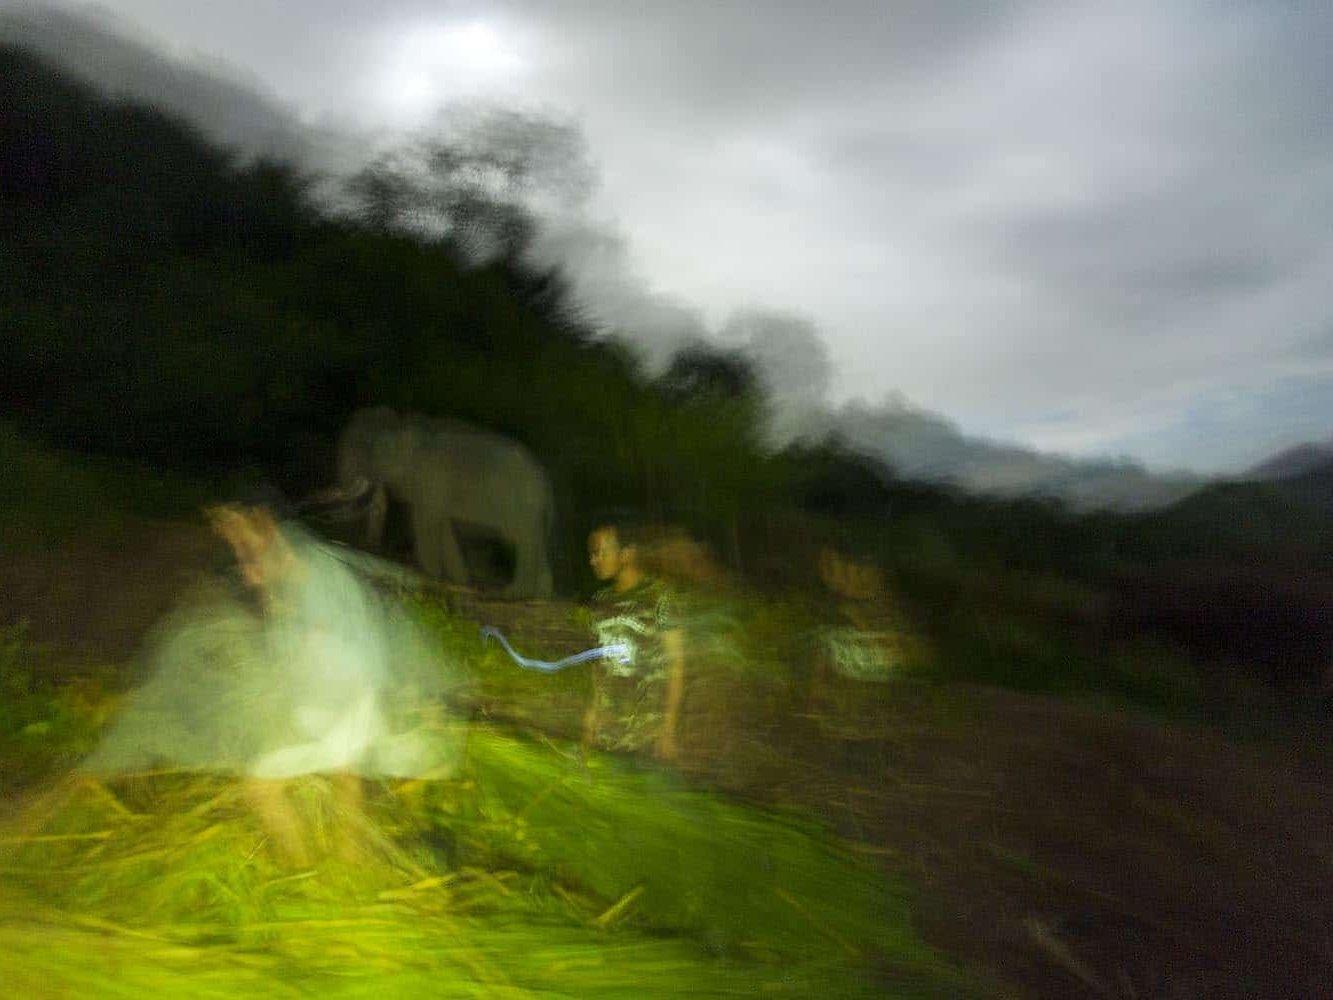 vietnam photographer mahout family binhdang 5